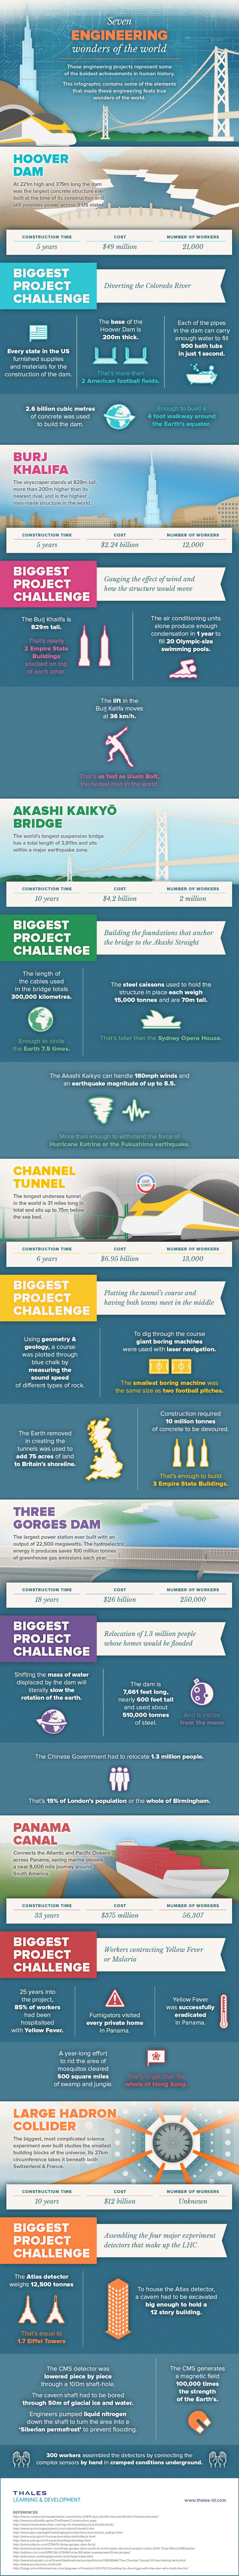 Seven Engineering Wonders of the World